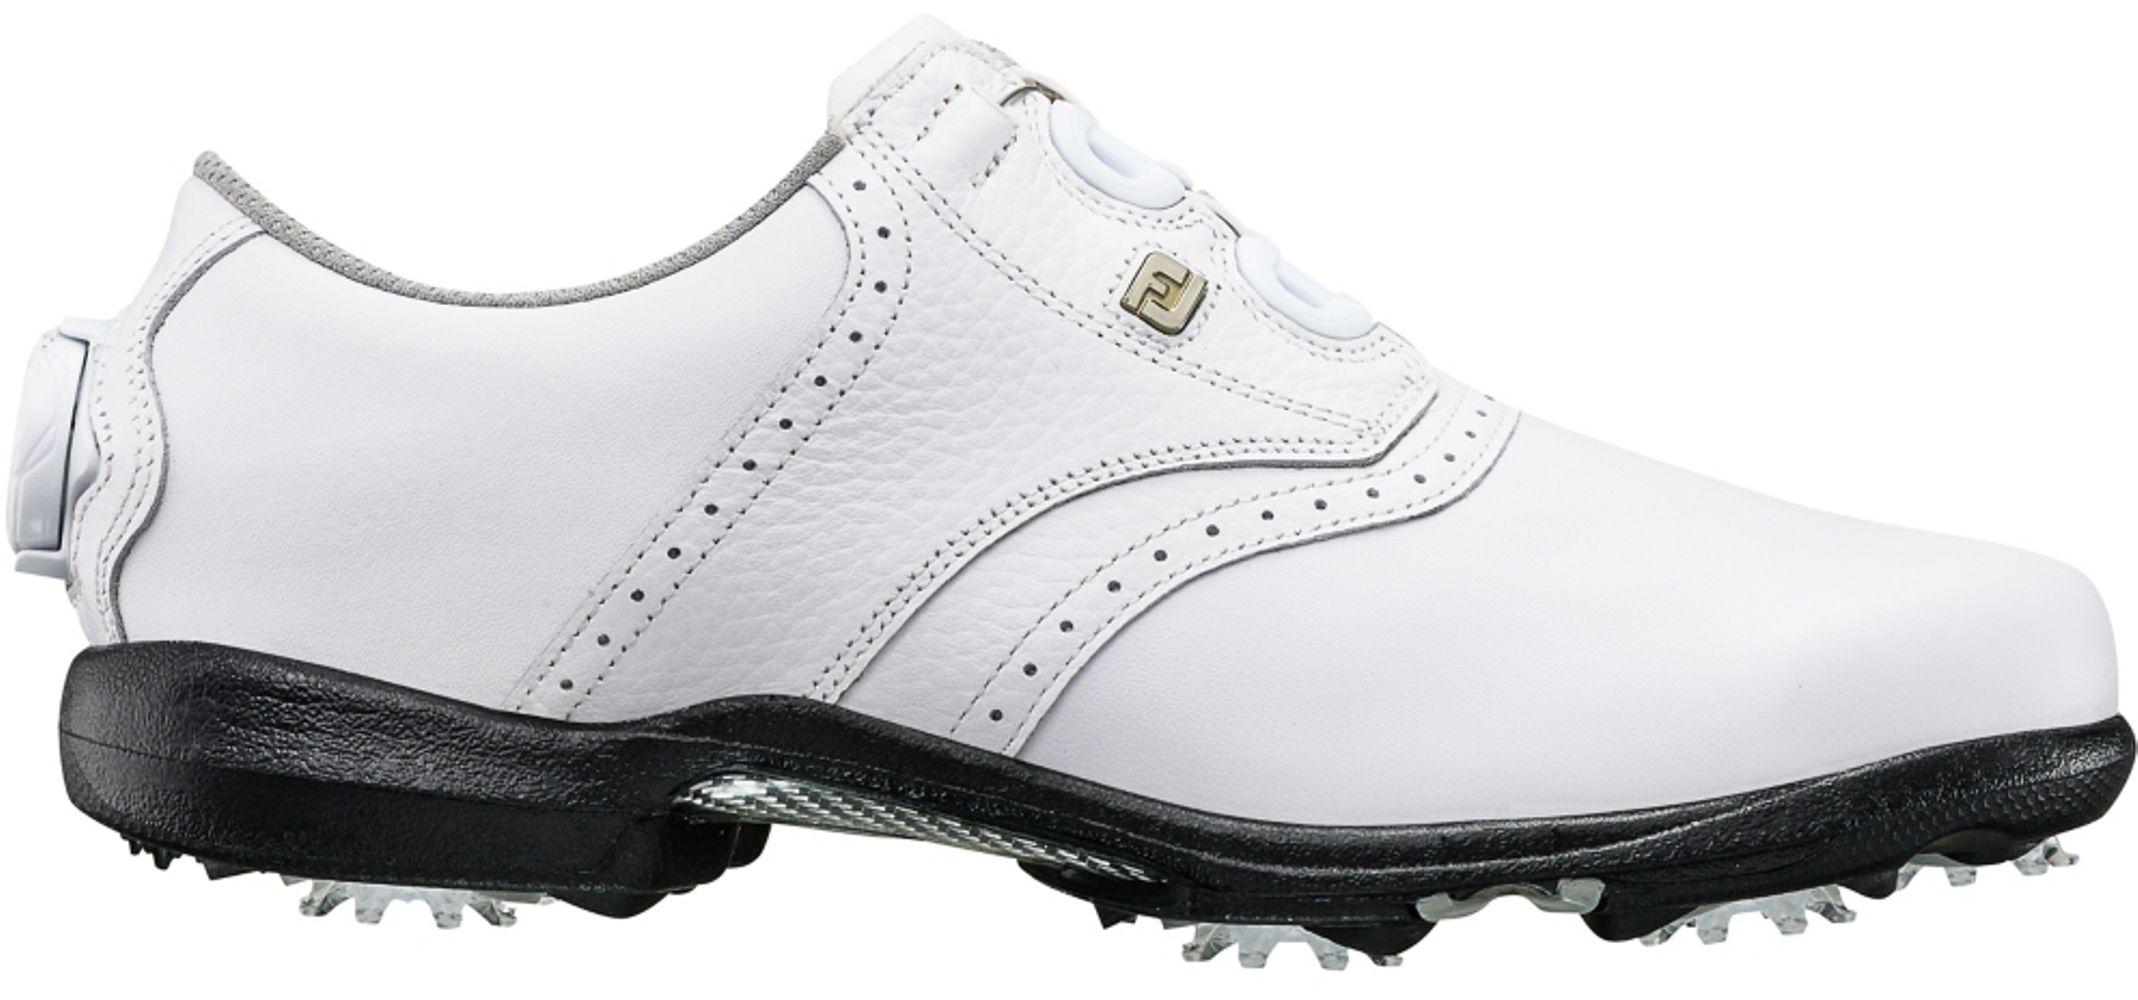 Footjoy Damen DryJoys Golfschuhe, Weiß (White 99017), 40.5 EU